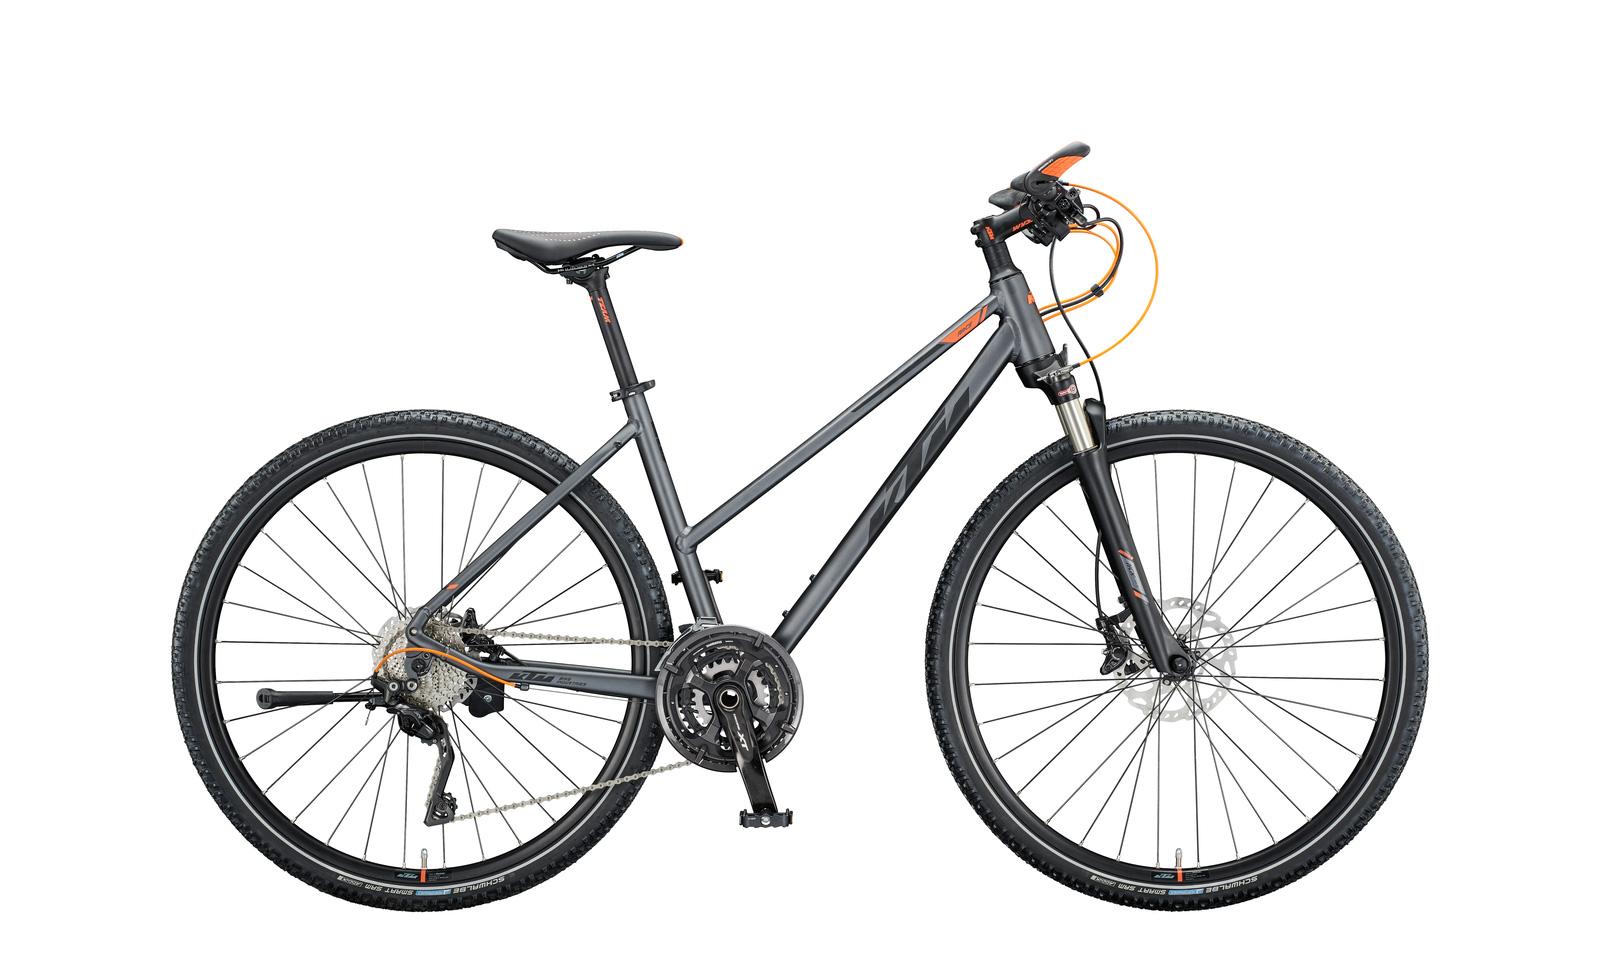 Biciclete KTM Trekking Offroad LIFE RACE 3x10 Shimano Deore XT